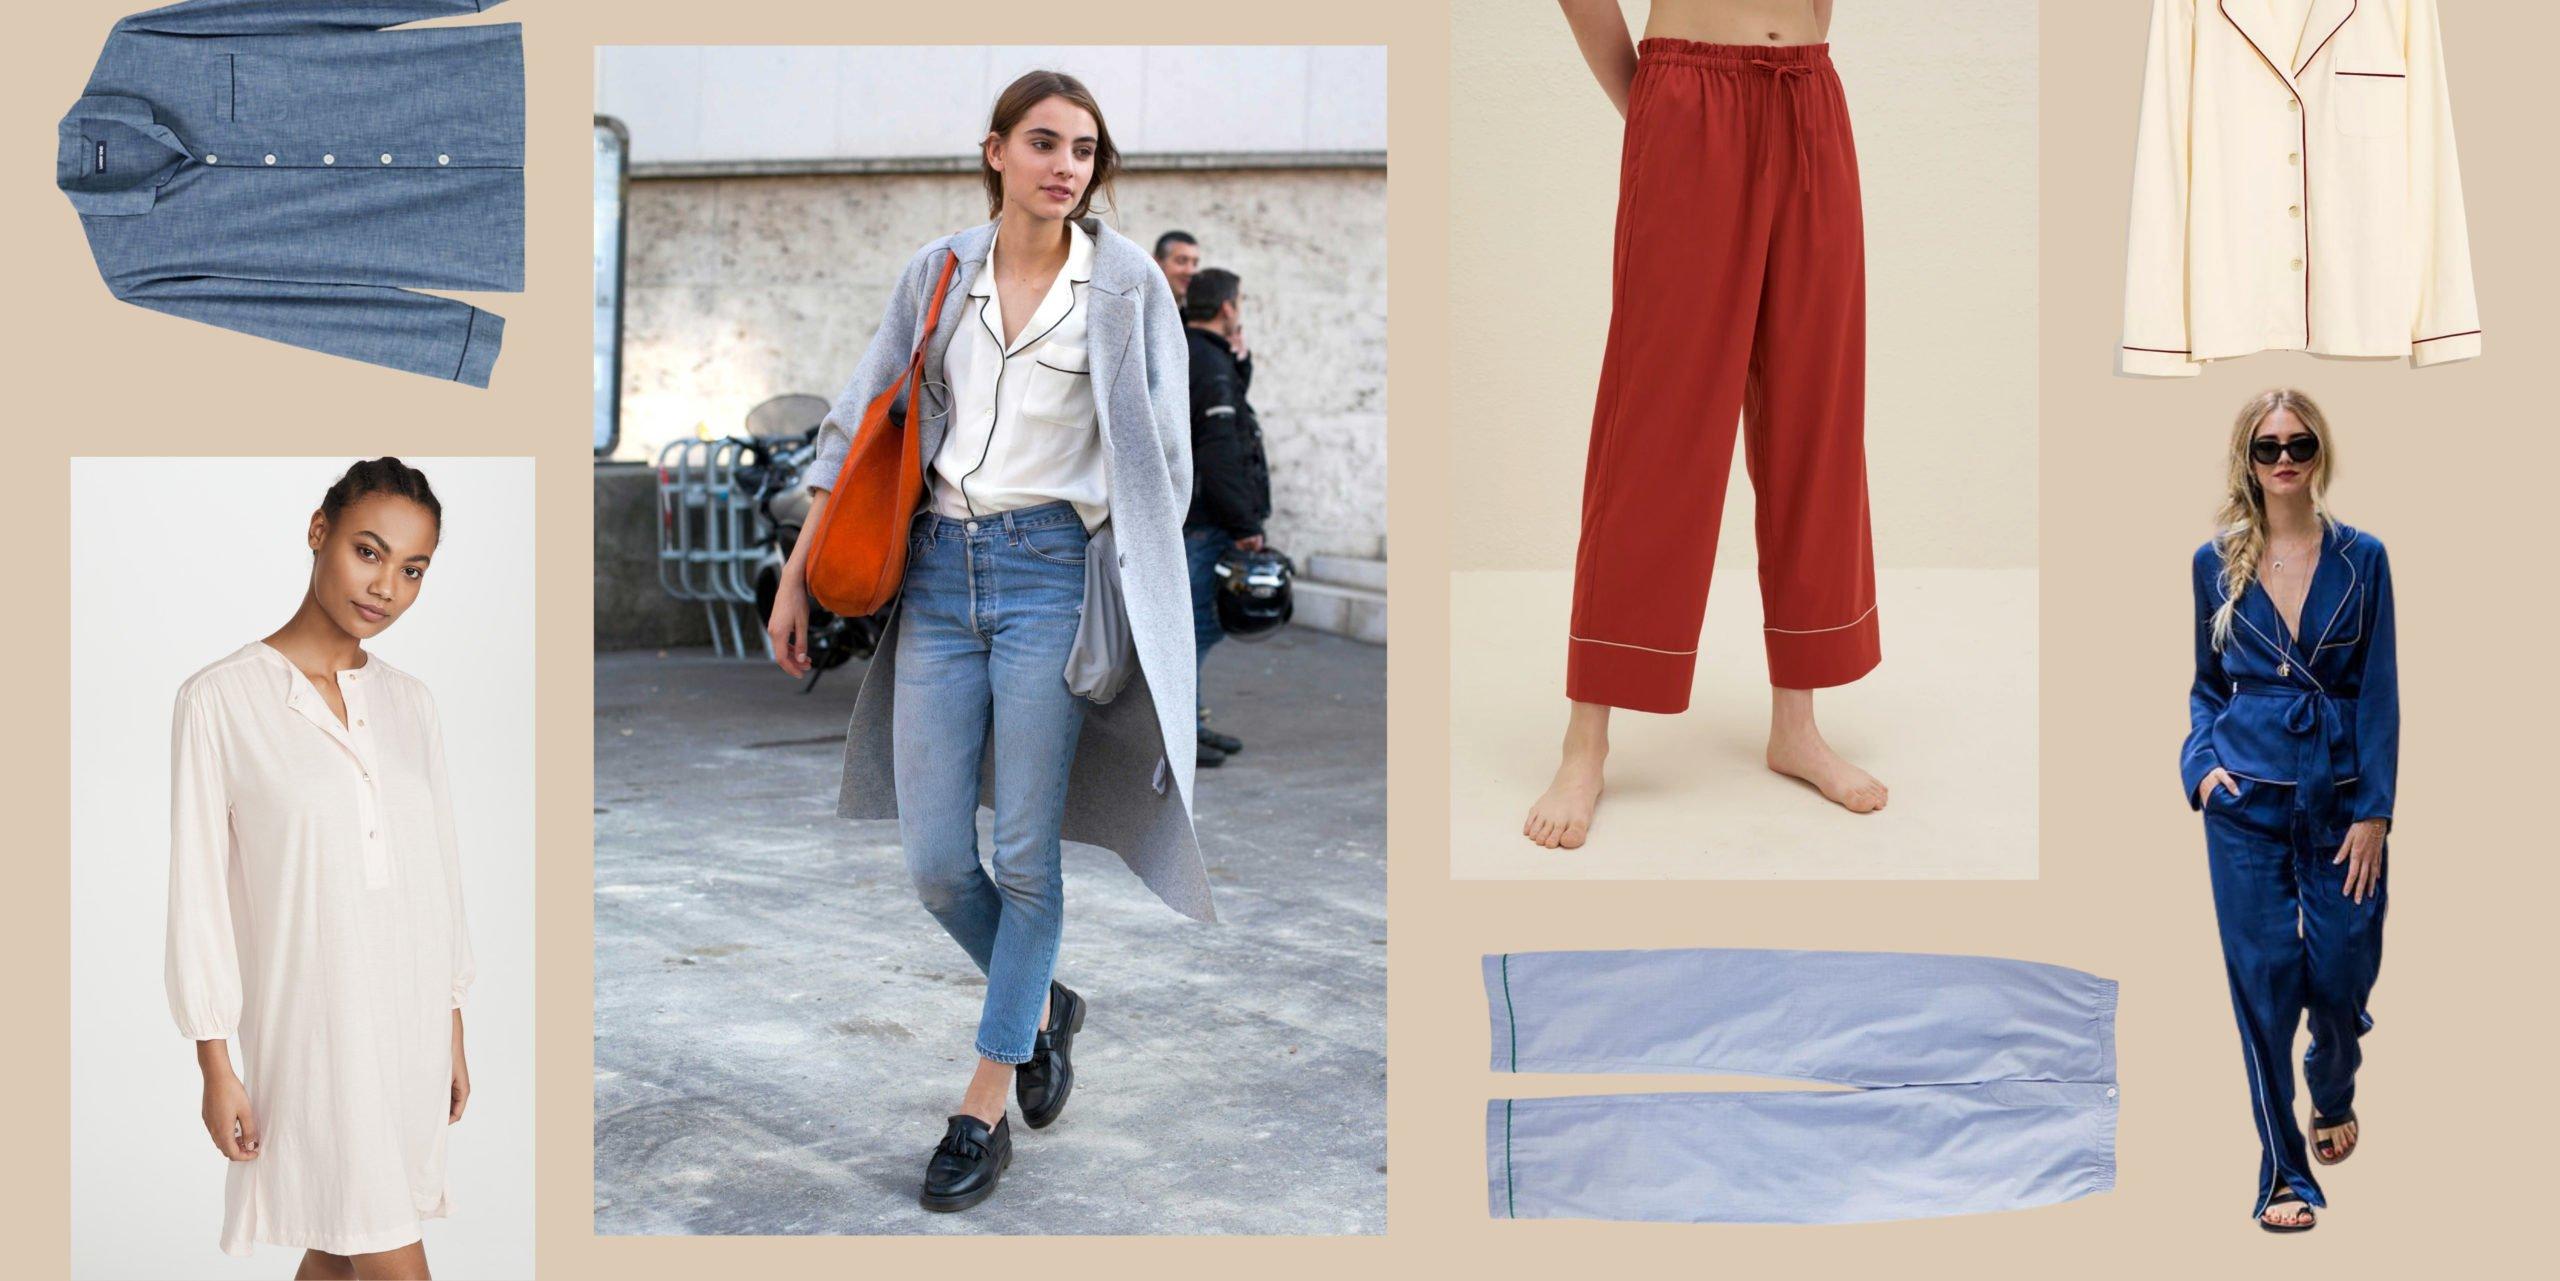 5 Stylish Ways To Wear Pajamas (Out Of The House) - Bobby Berk